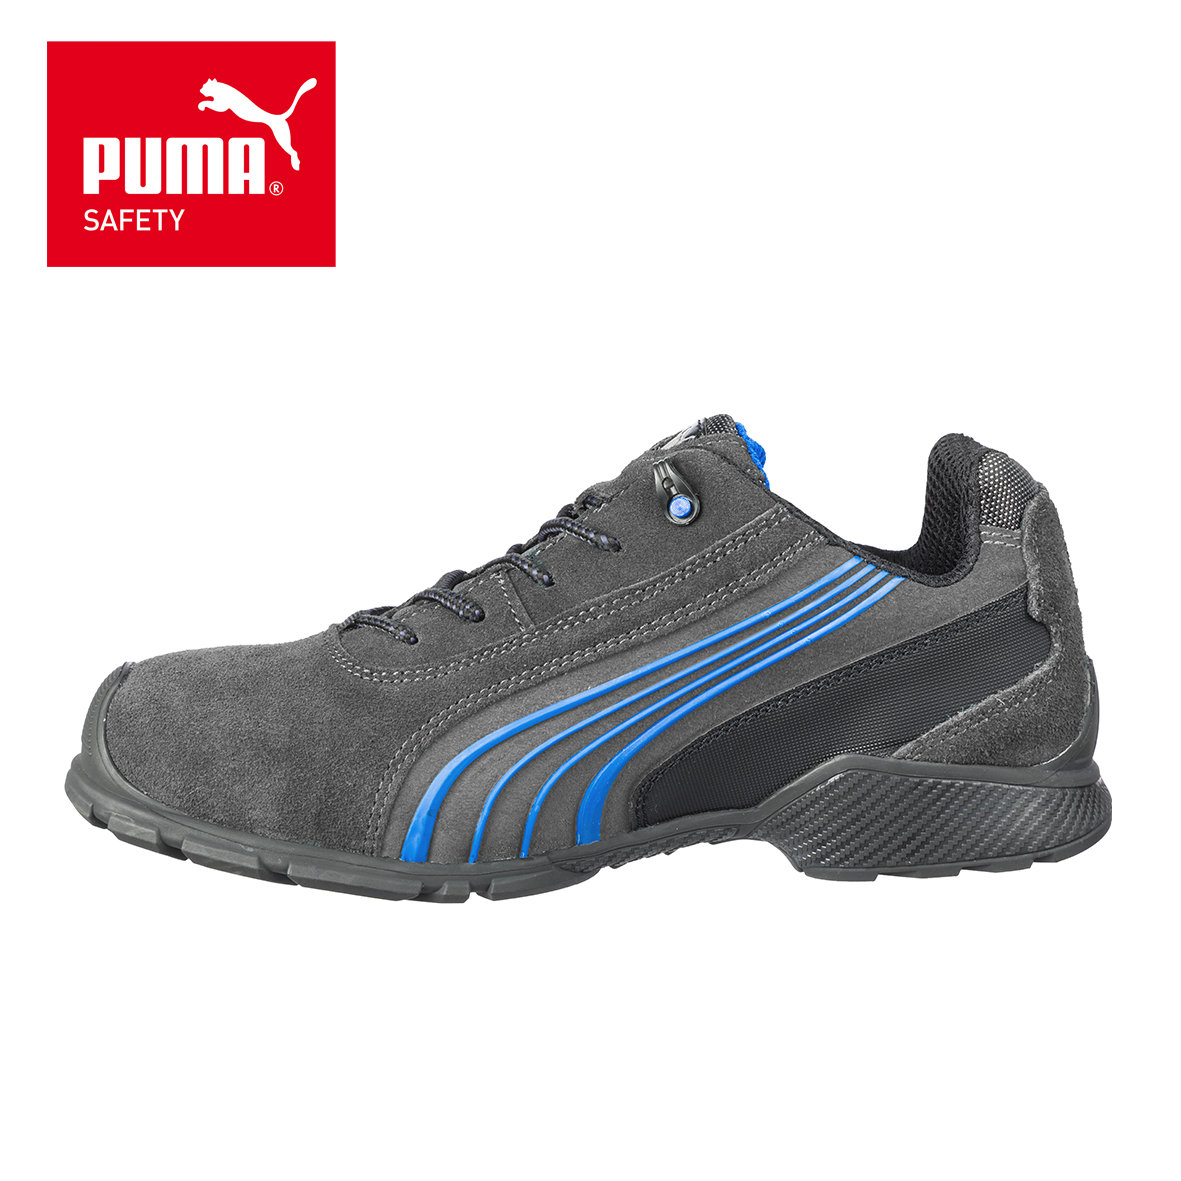 Puma Safety Milano